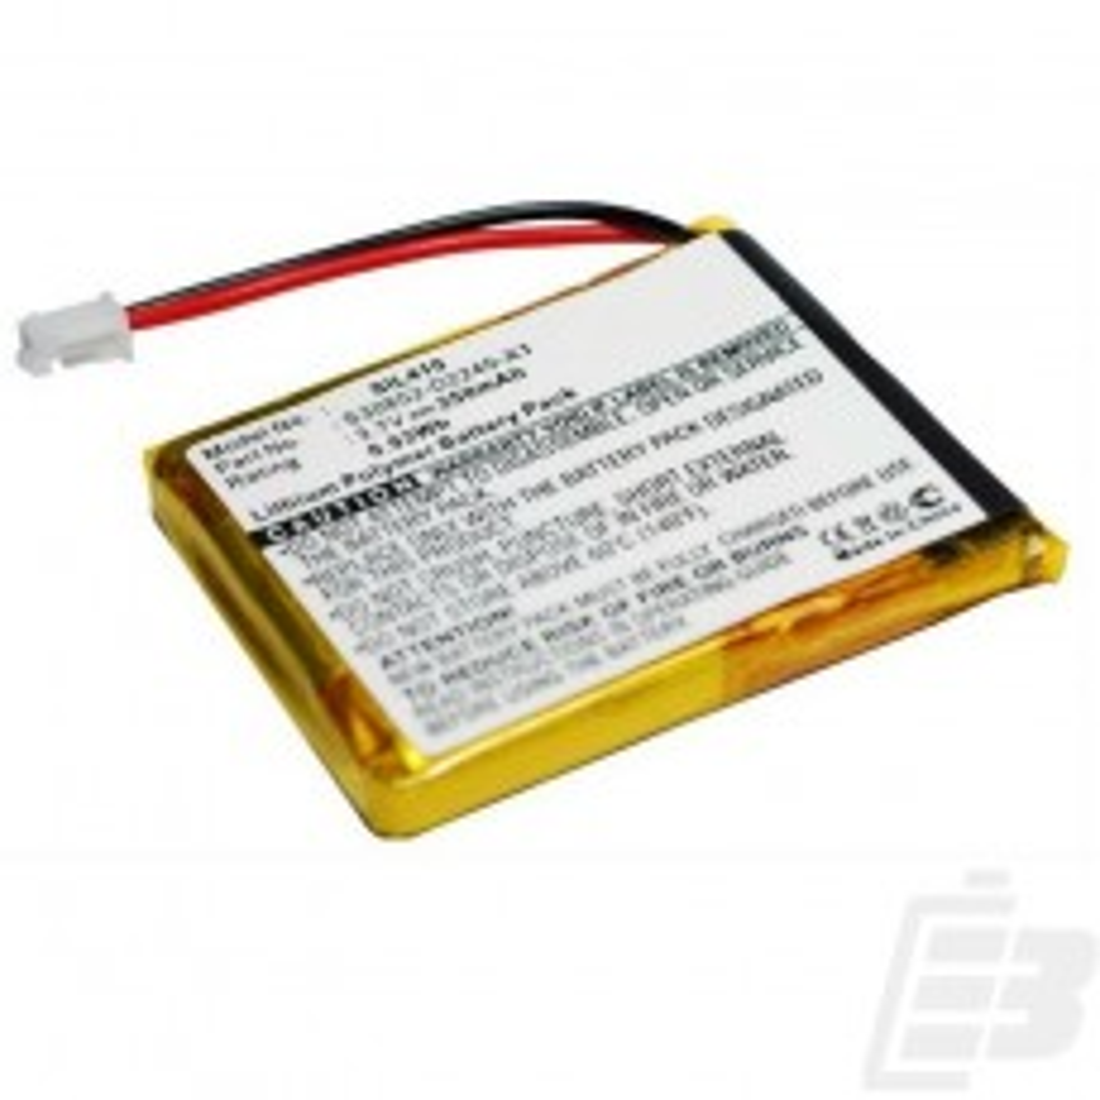 Cordless phone battery Siemens Gigaset L410_1